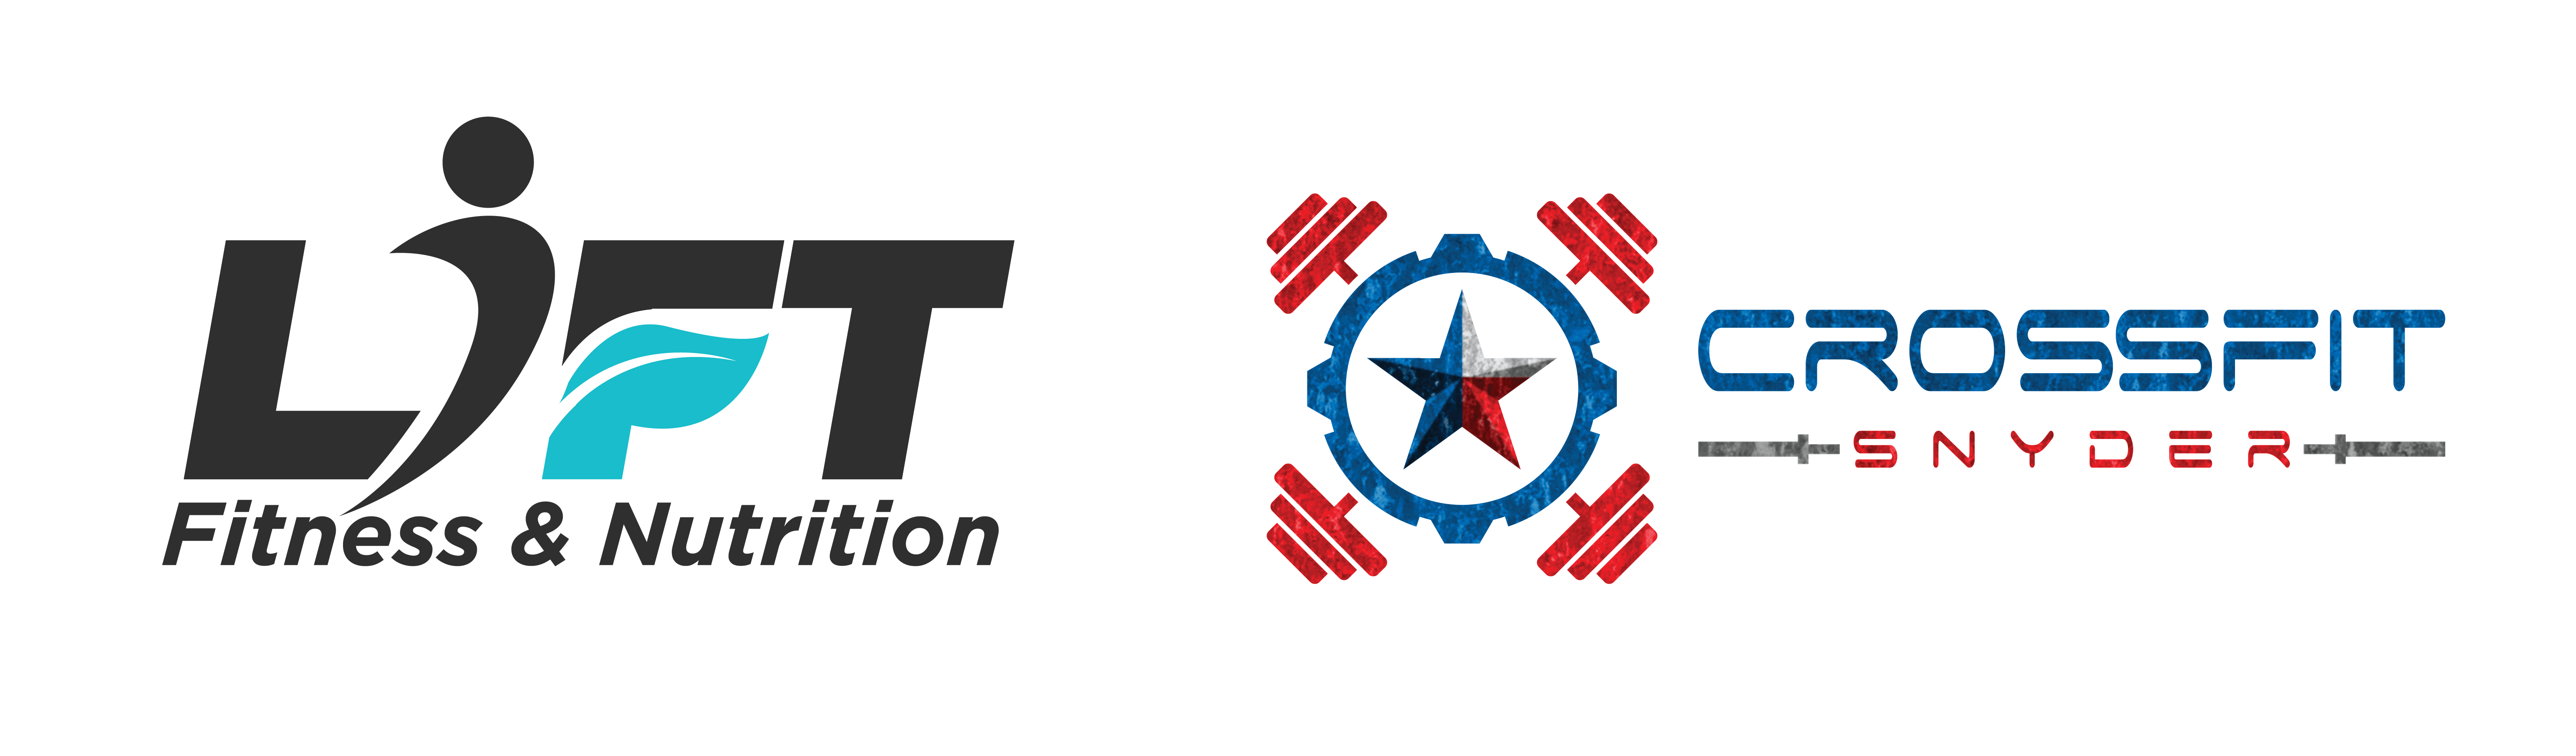 Lift Snyder and CrossFit Snyder logo